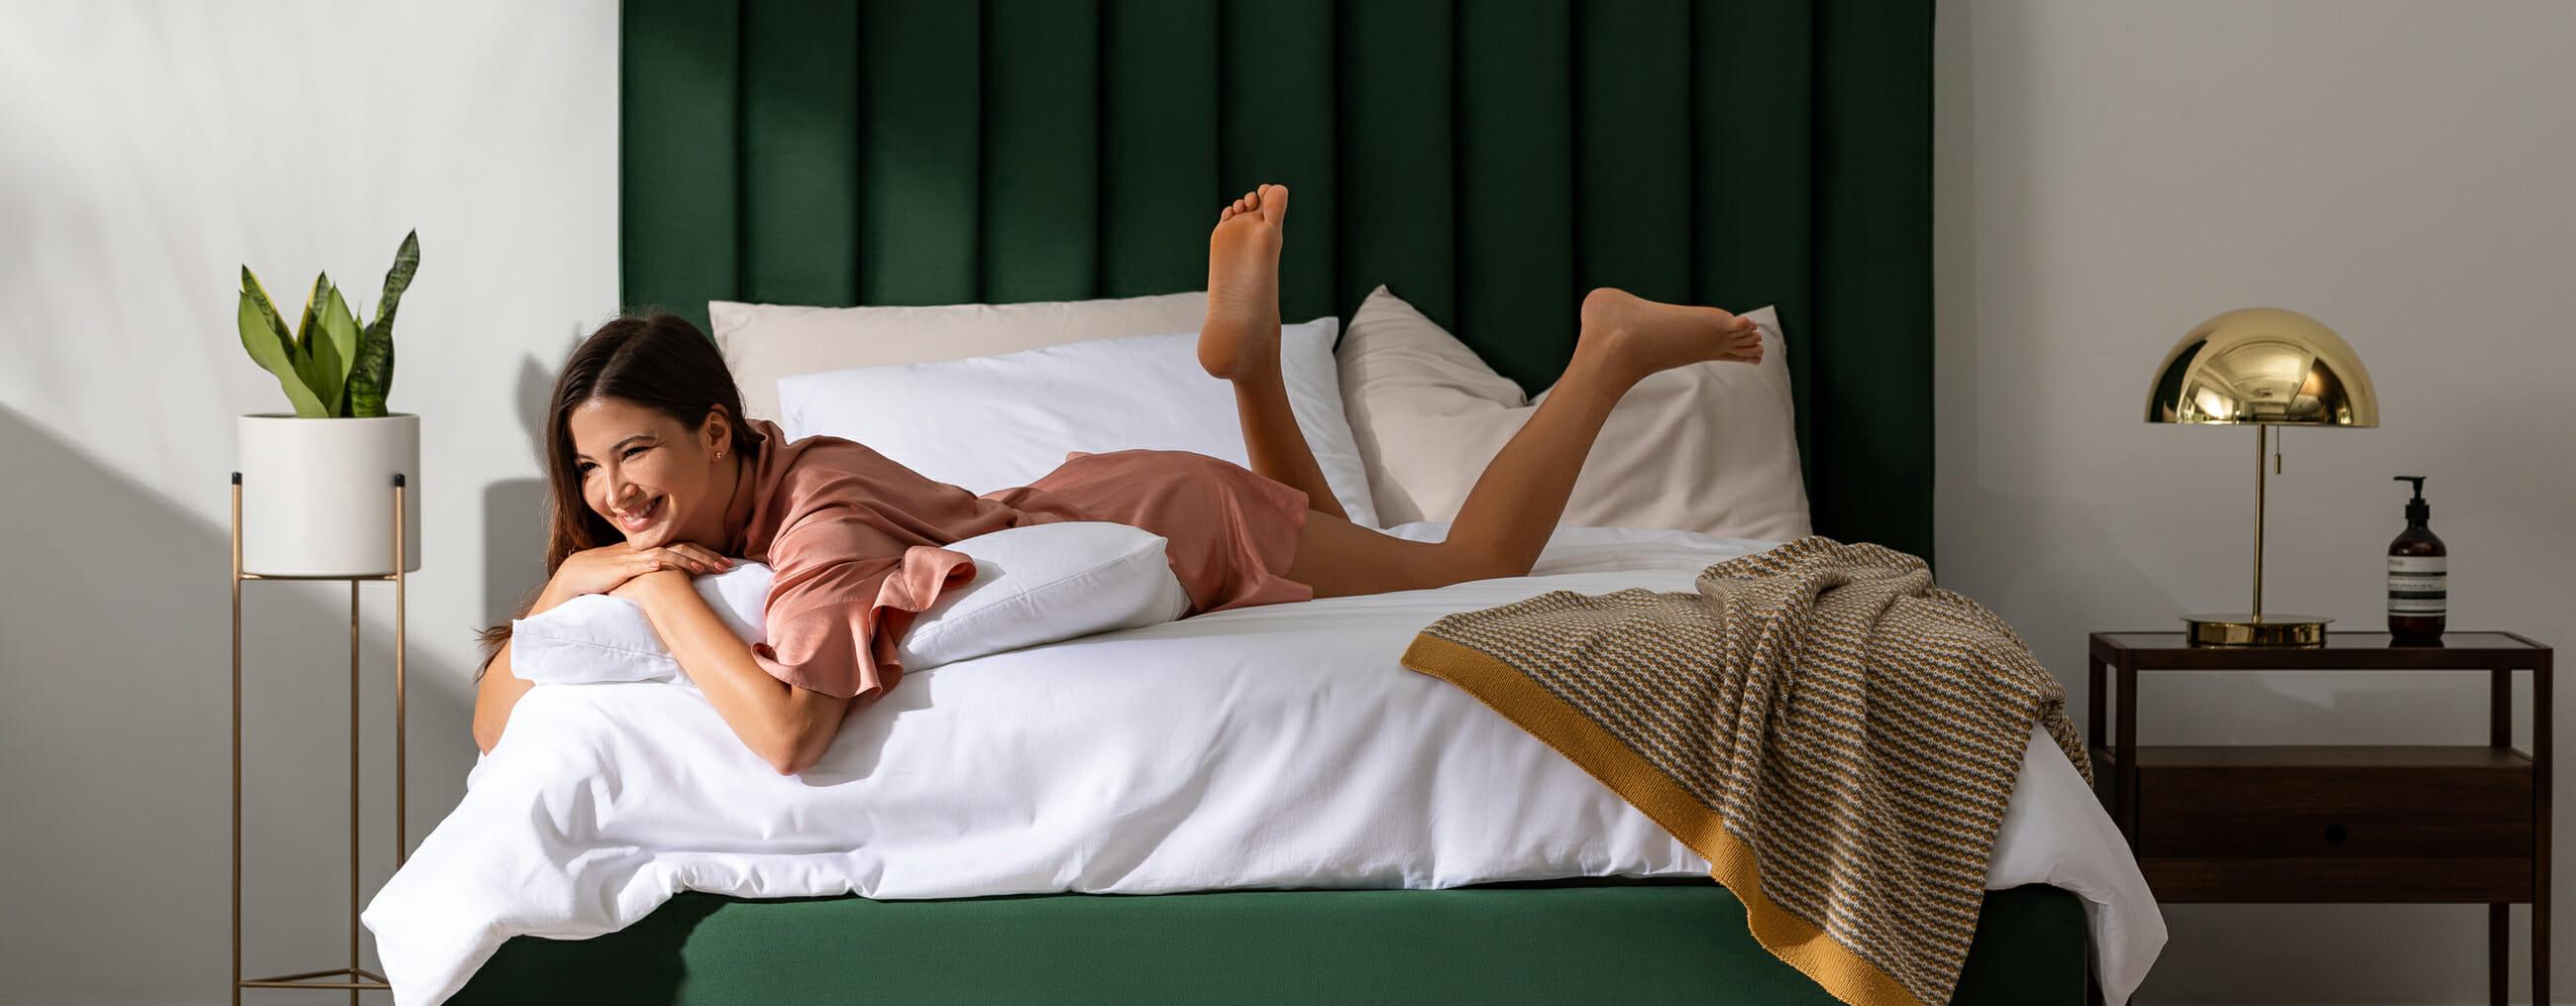 Parker bed - green